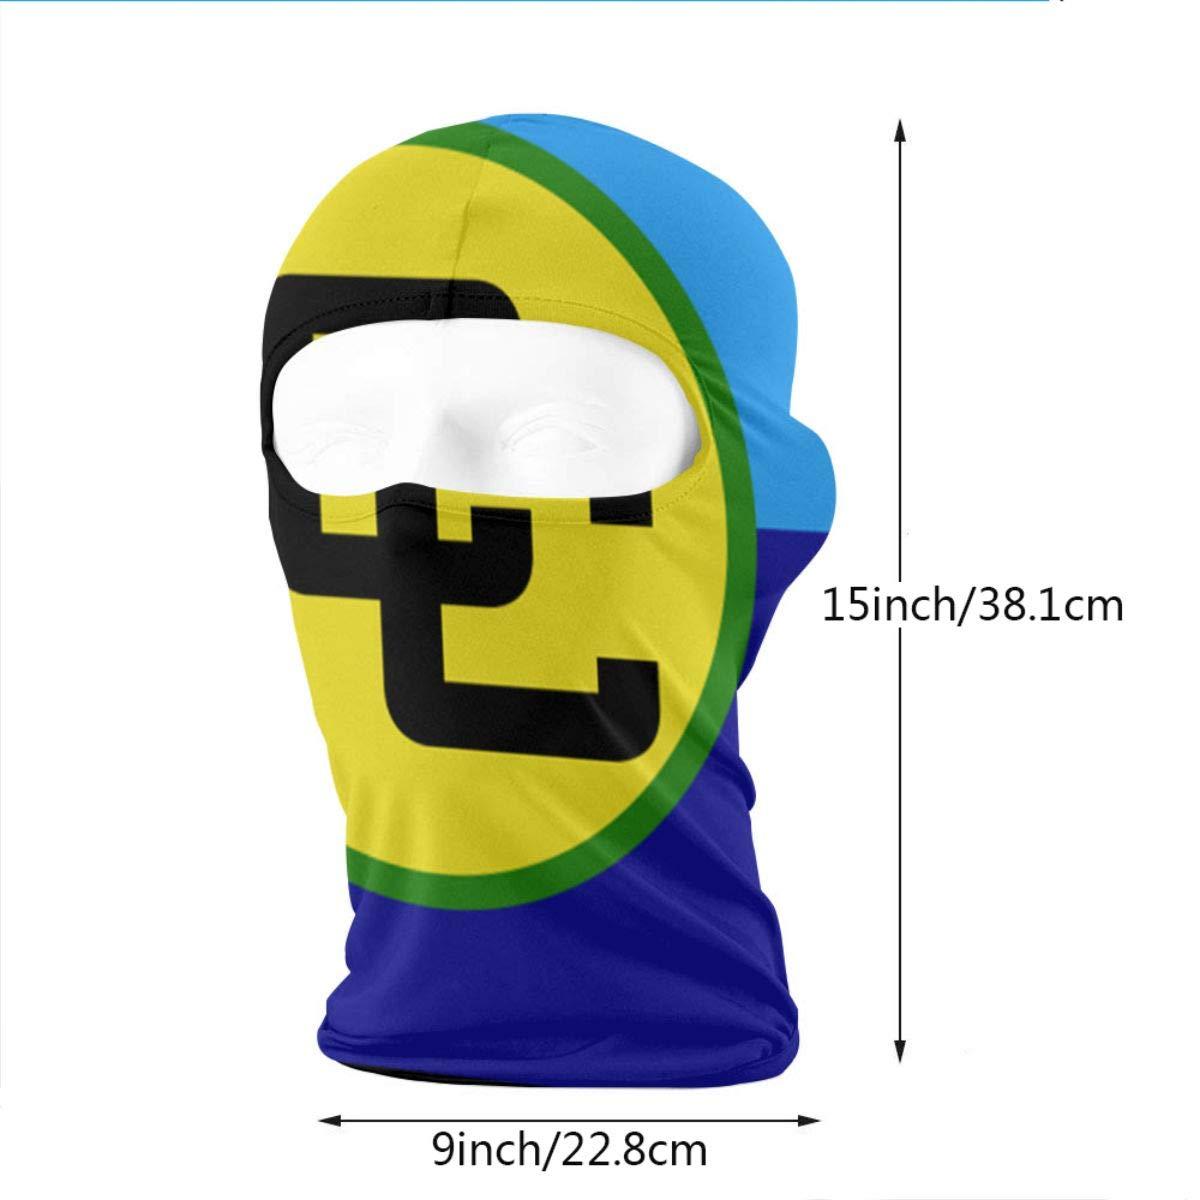 Wind-Resistant Face Mask LaoJi Caribbean Community Flag Winter Ski Mask Balaclava Hood